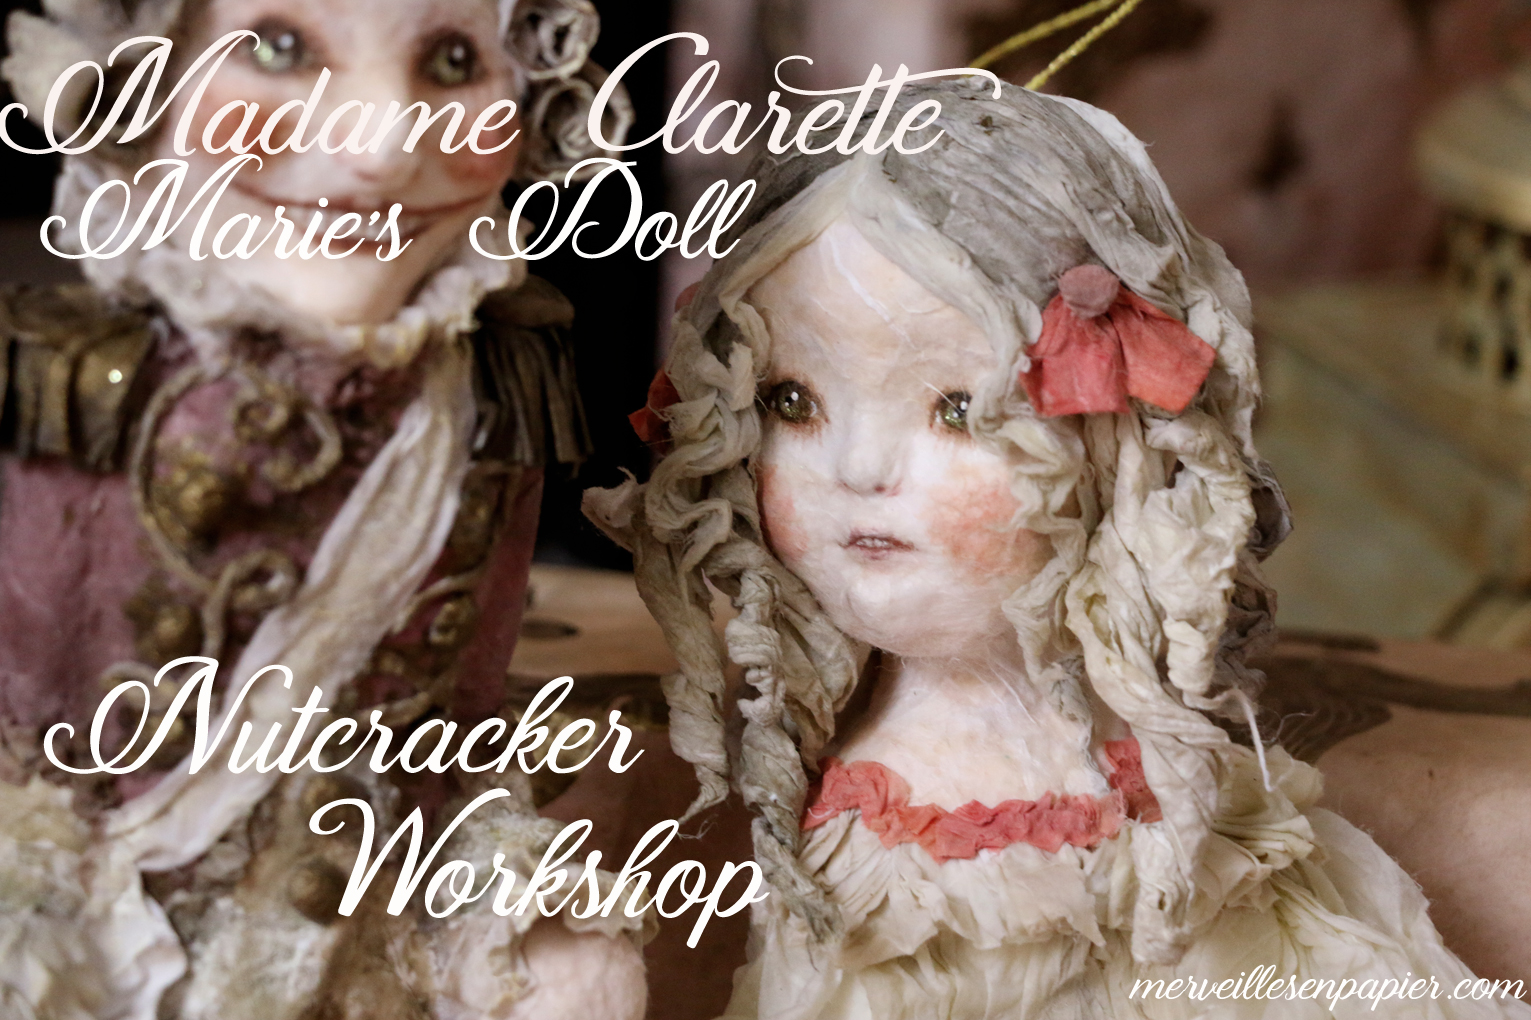 Marie's-doll-nutcracker-workshop.jpg